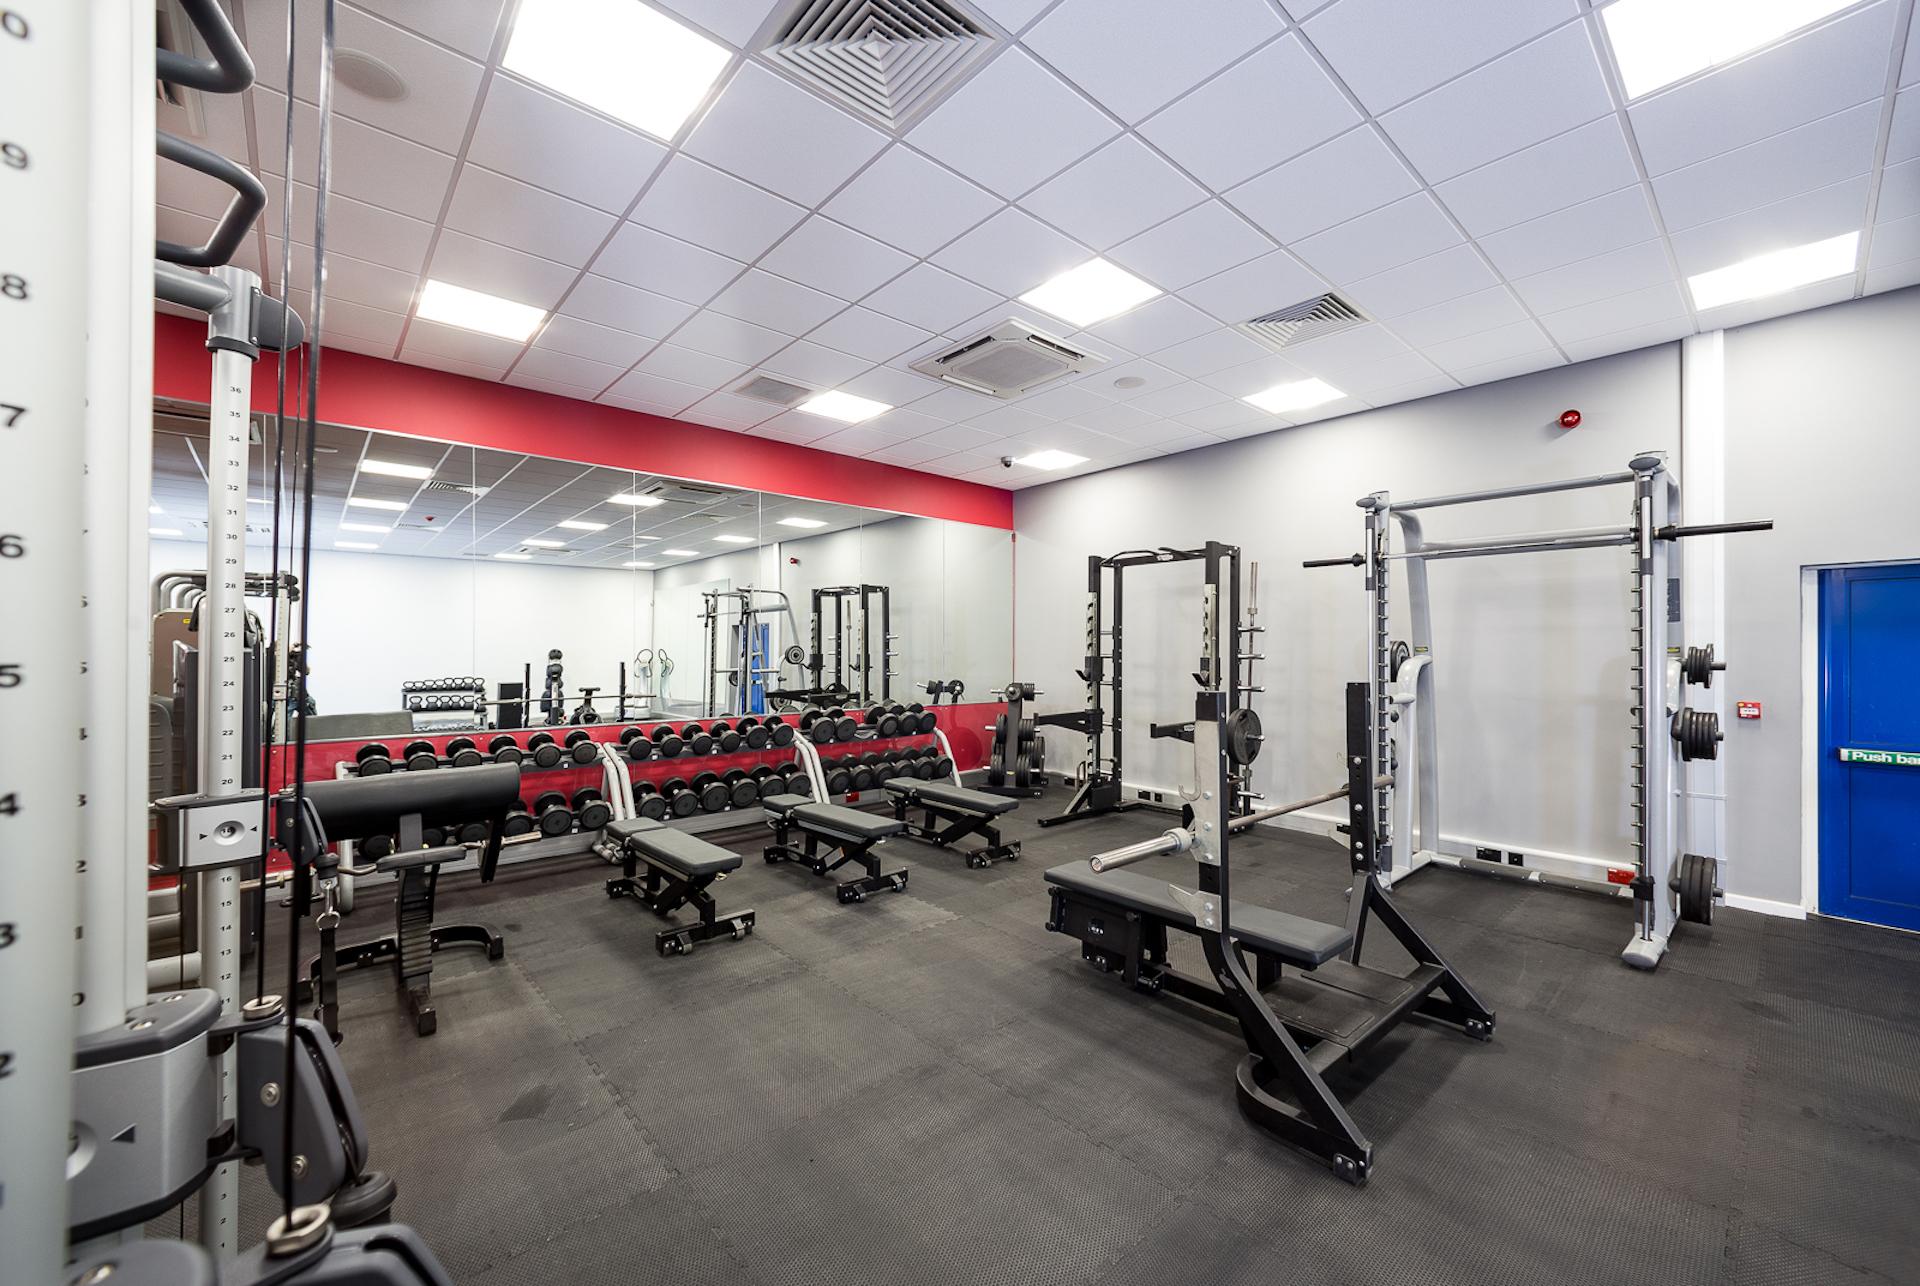 Colne Valley Leisure Centre 9